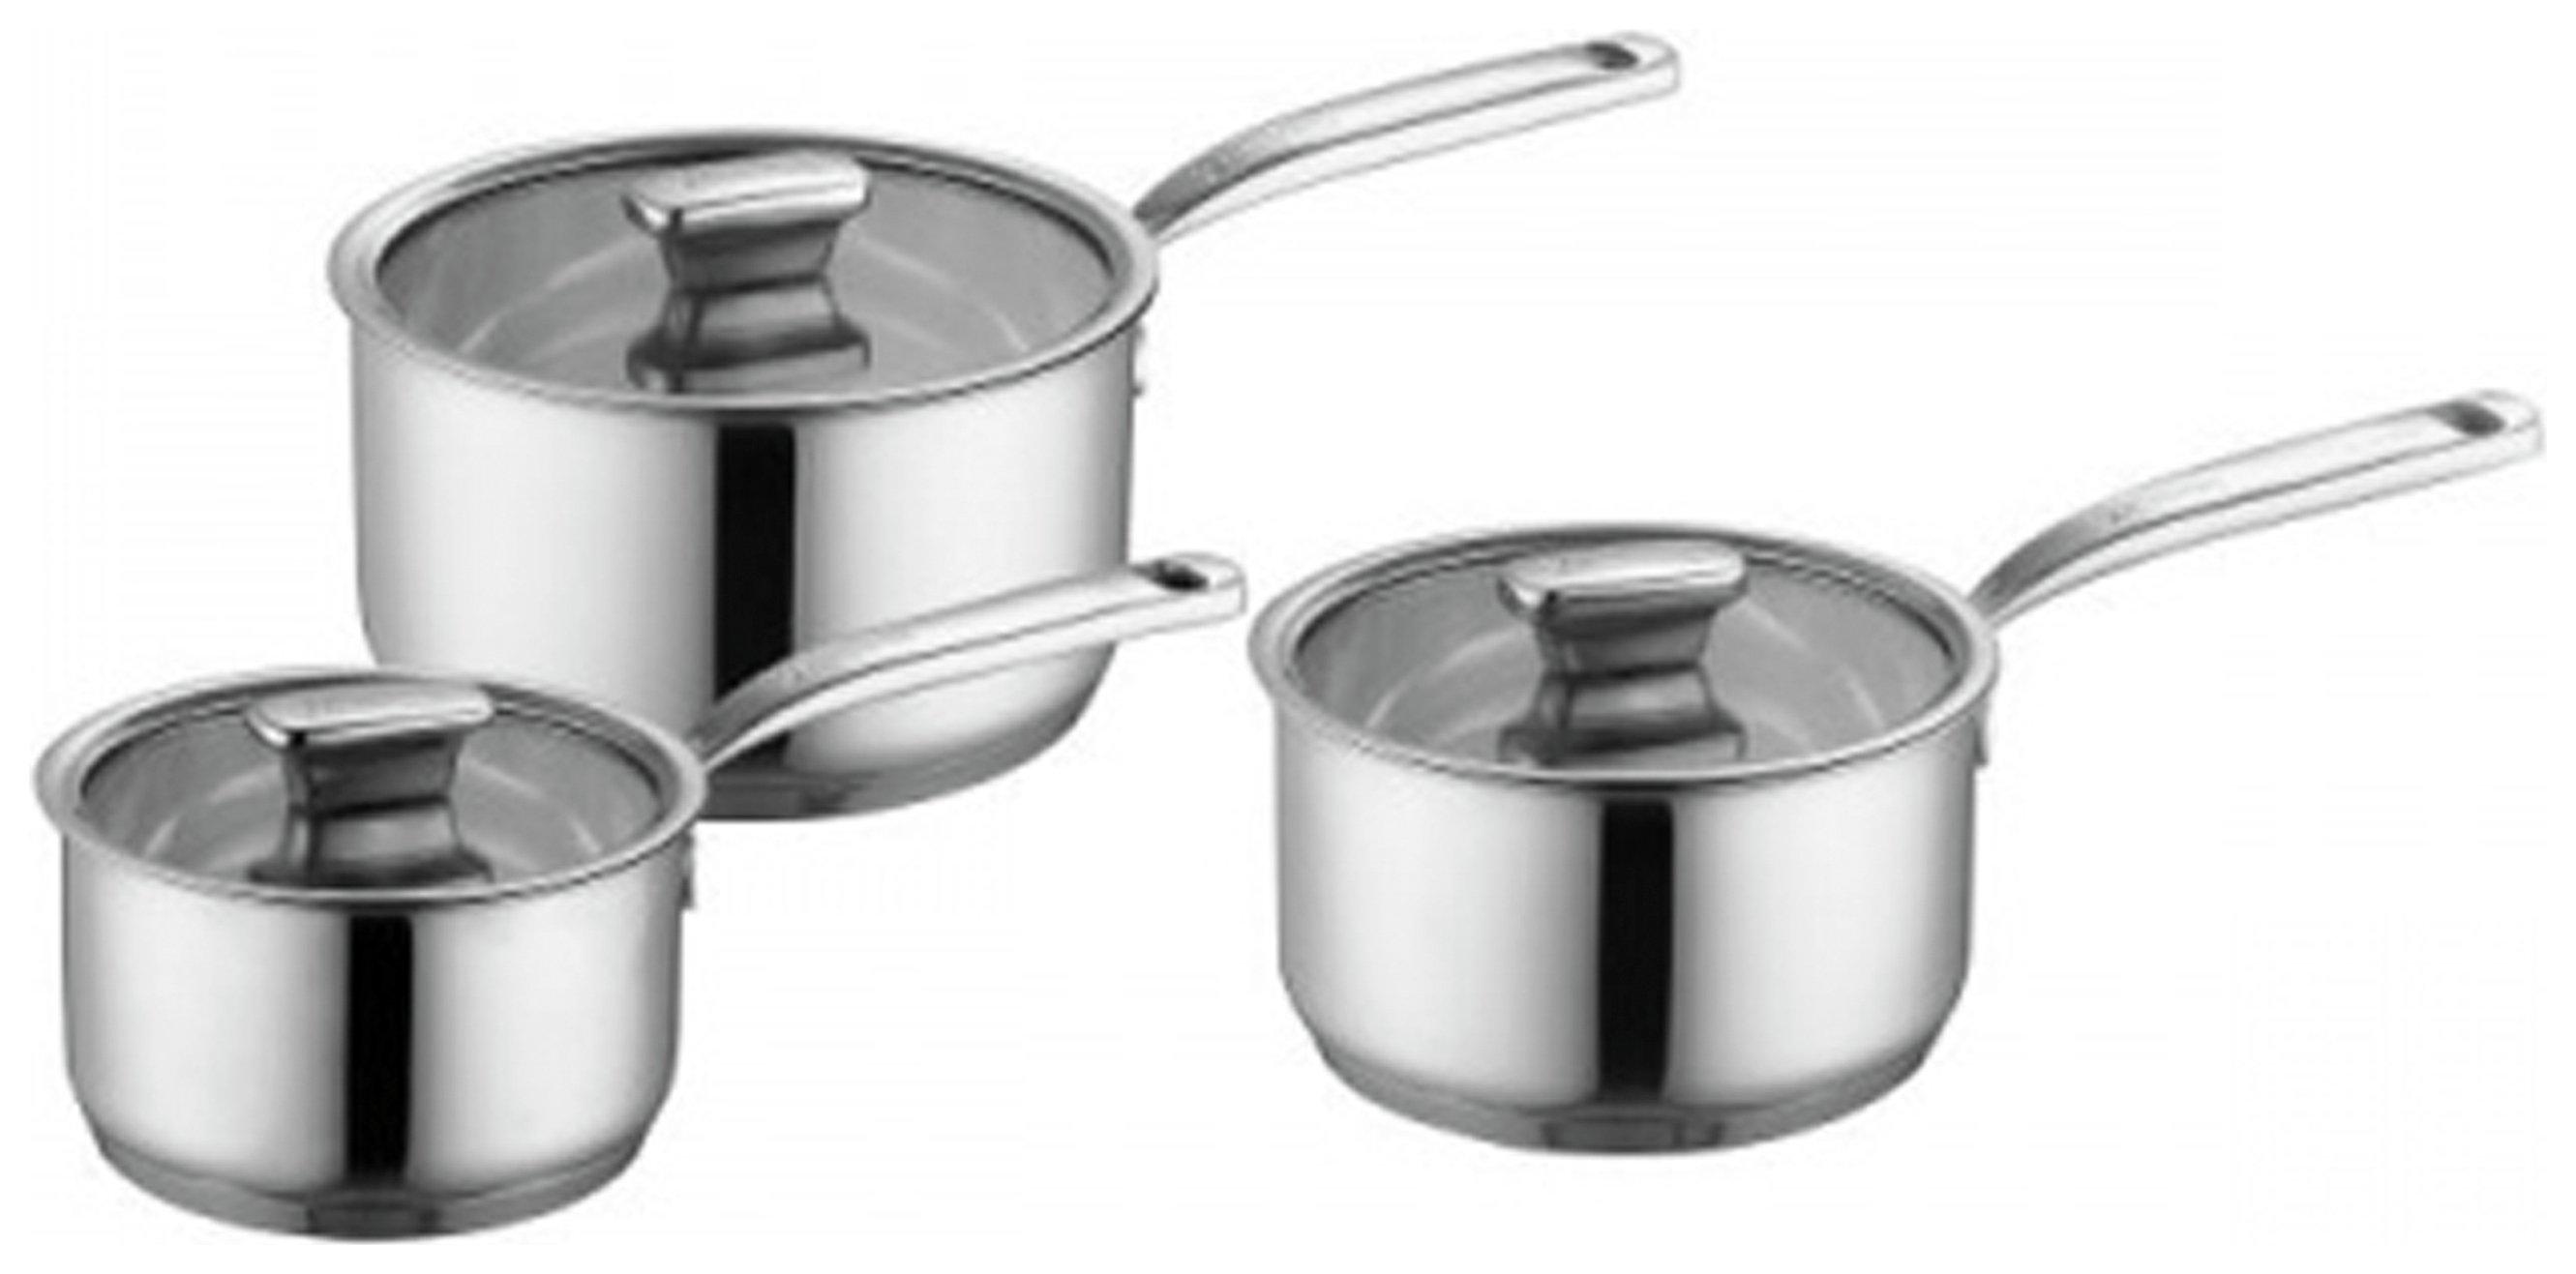 Zanussi Positano 3 Piece Stainless Steel Saucepan Set